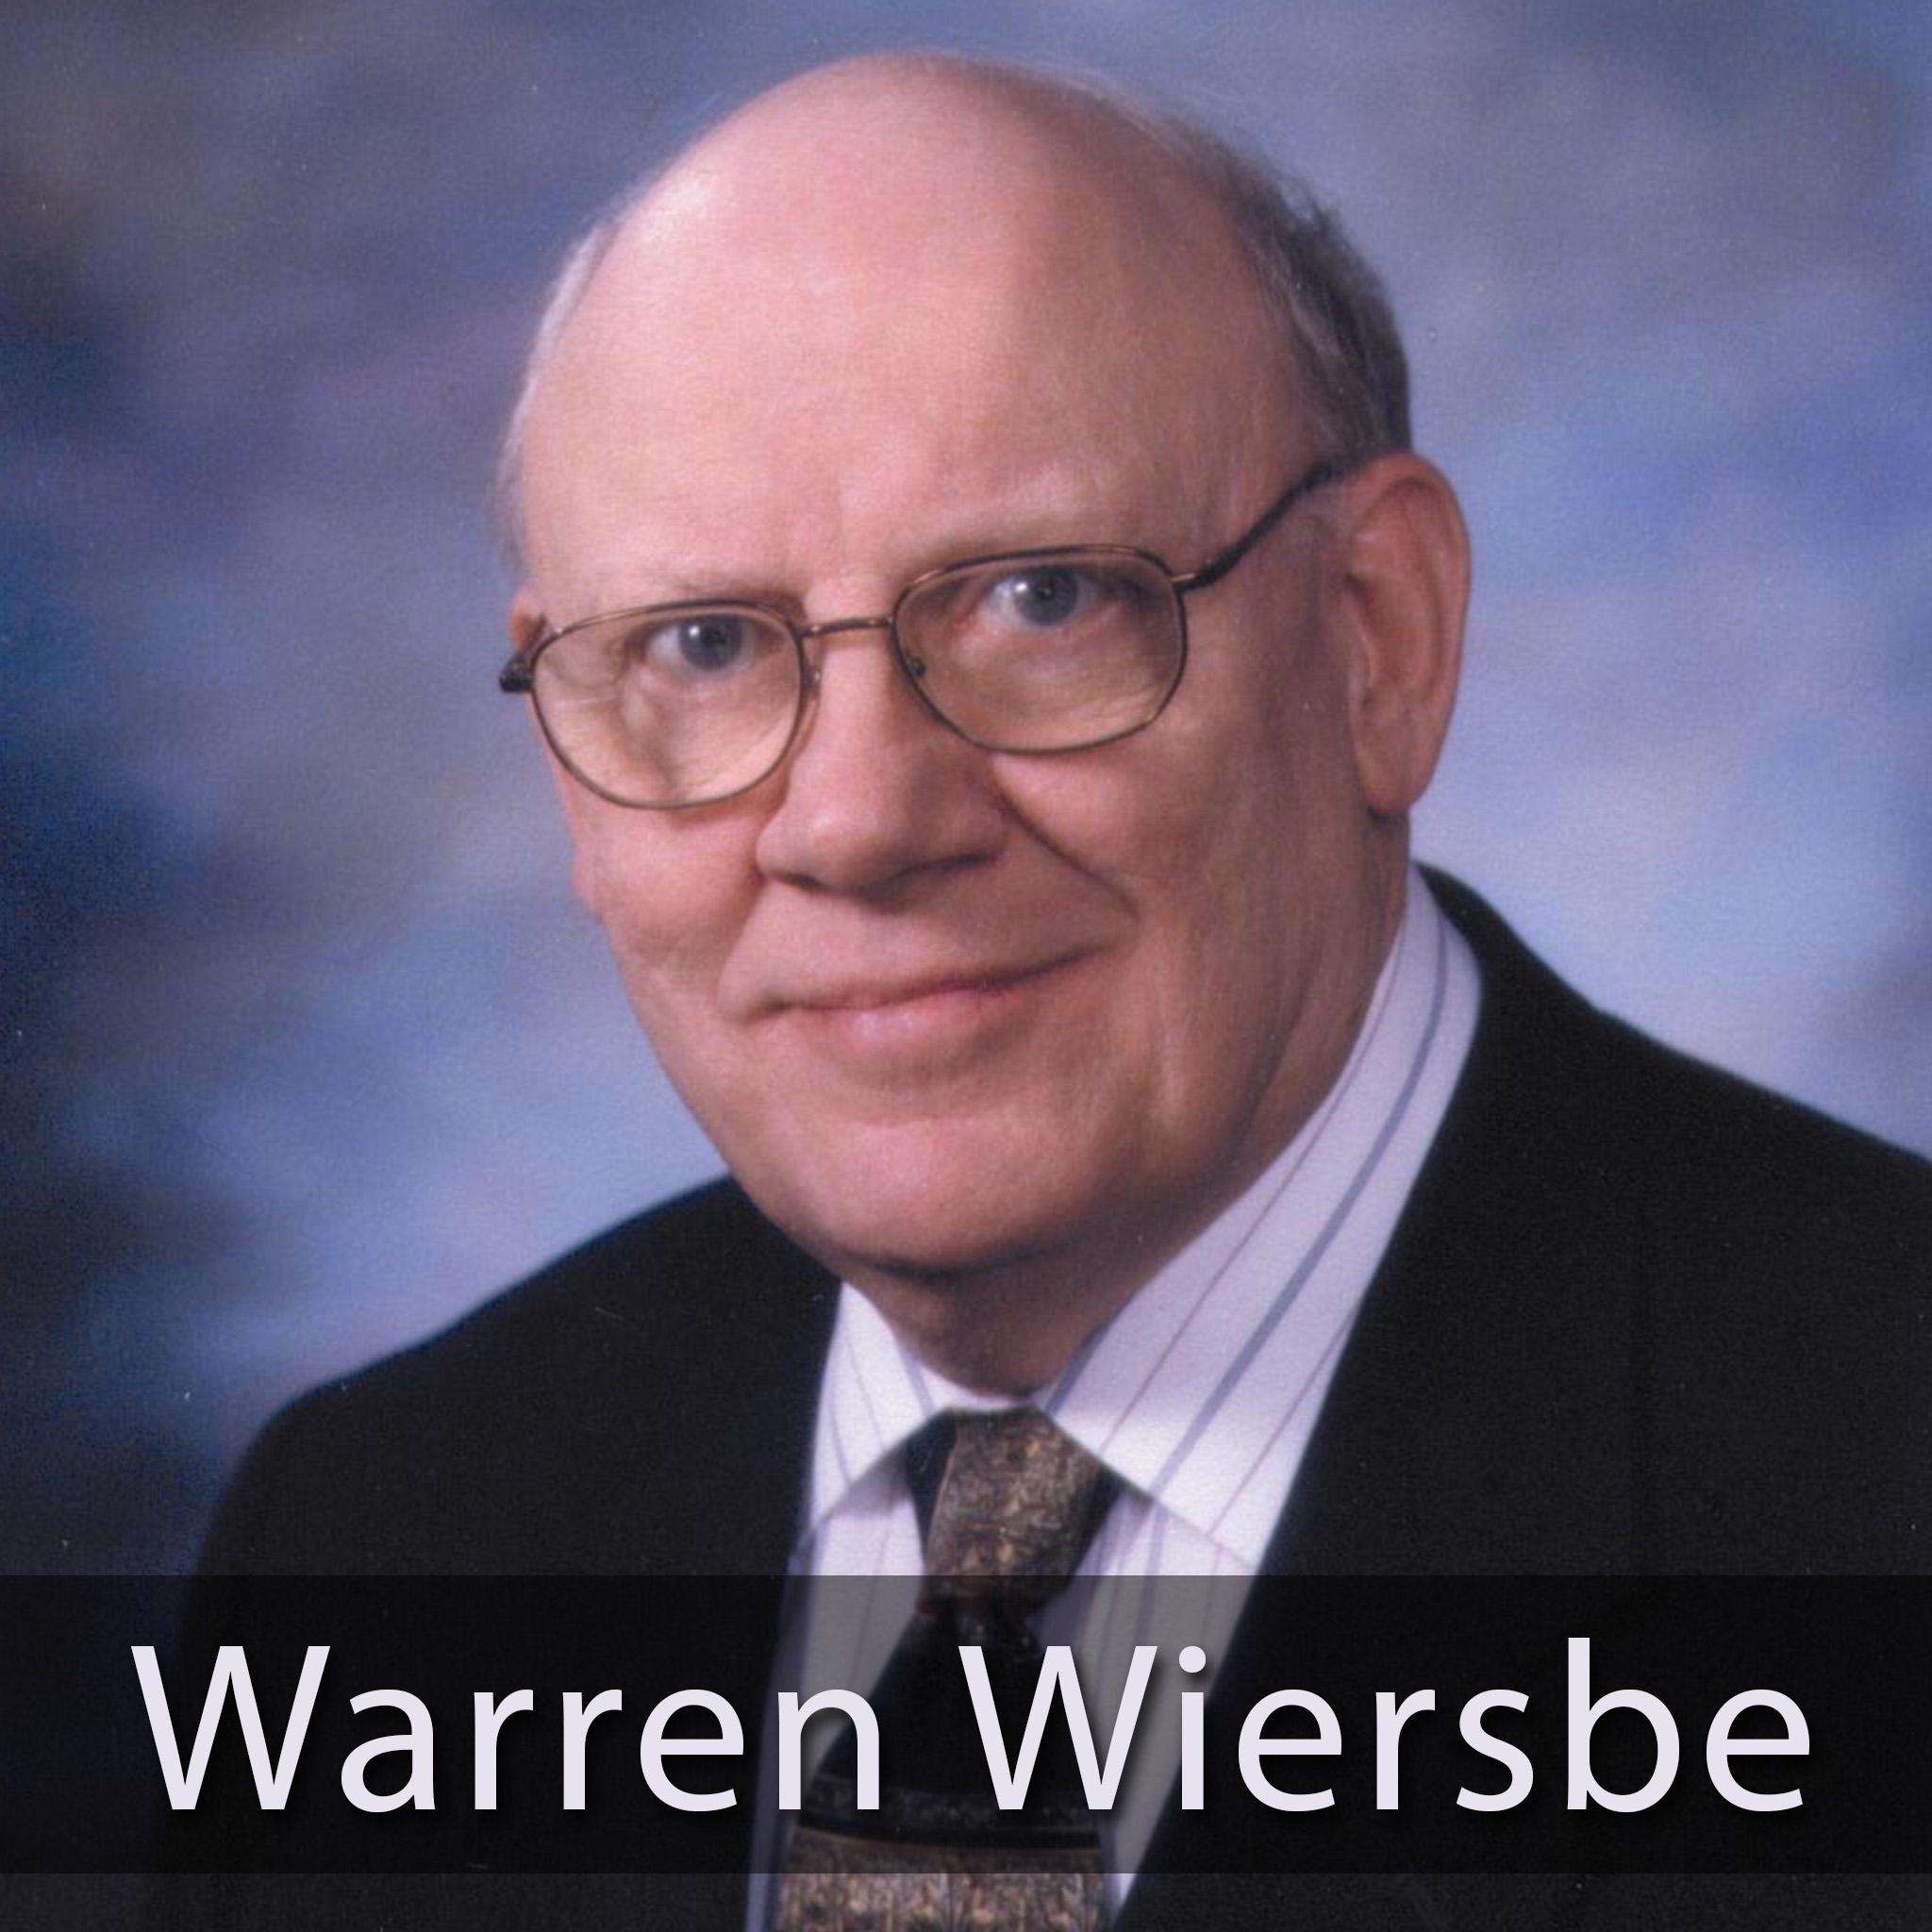 <![CDATA[Warren Wiersbe Podcast]]>